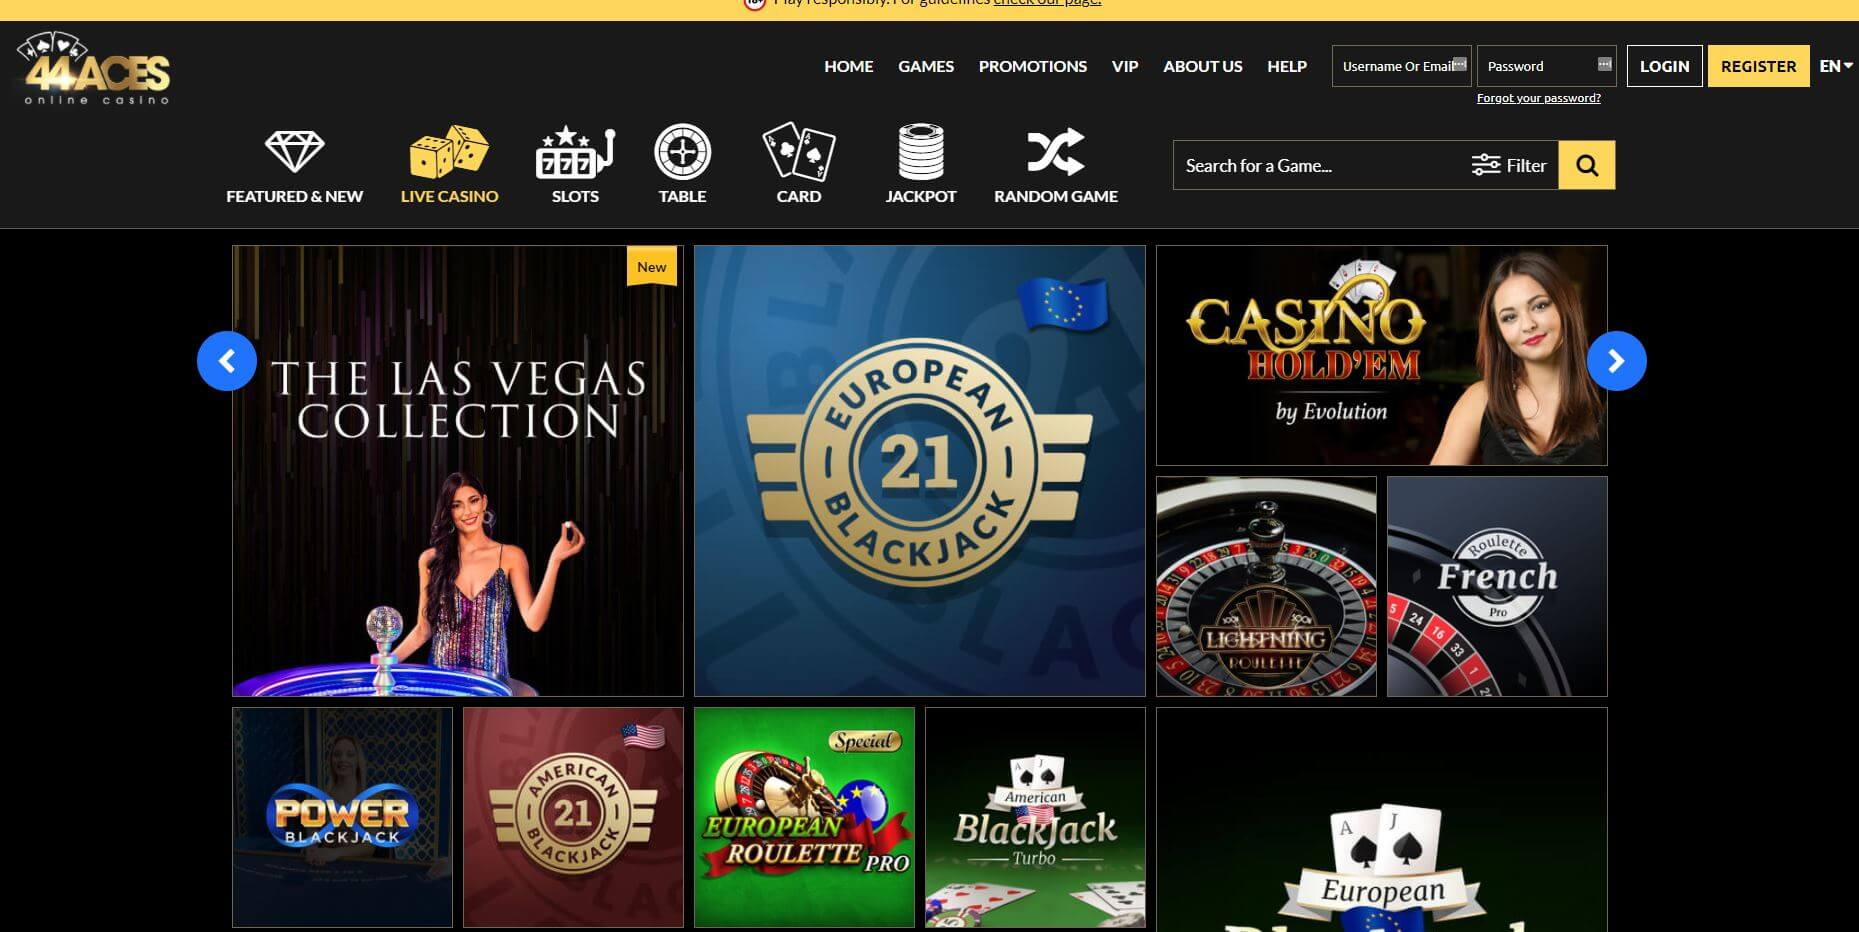 44Aces Live Casino